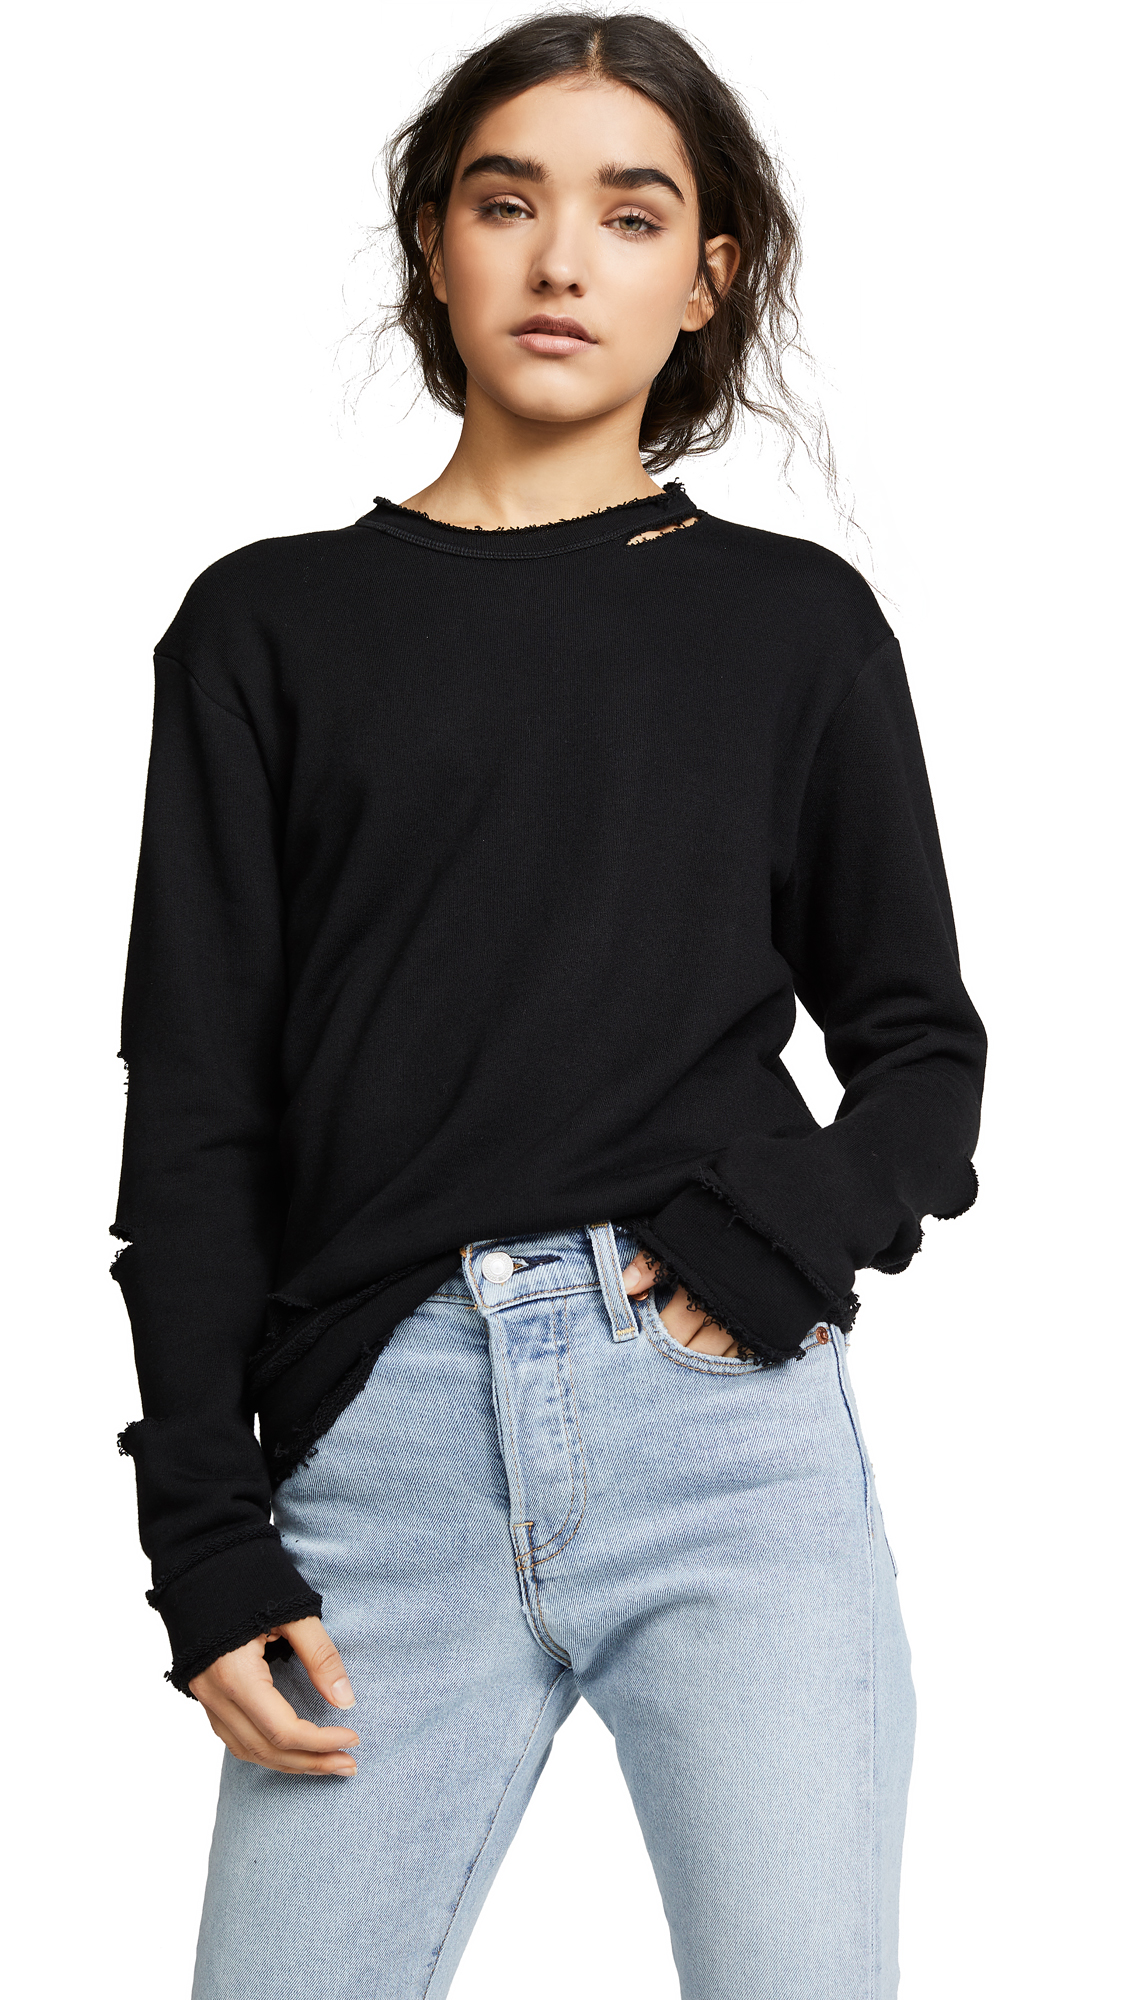 ALALA Cypher Crewneck Slashed Cotton Pullover Sweatshirt in Black